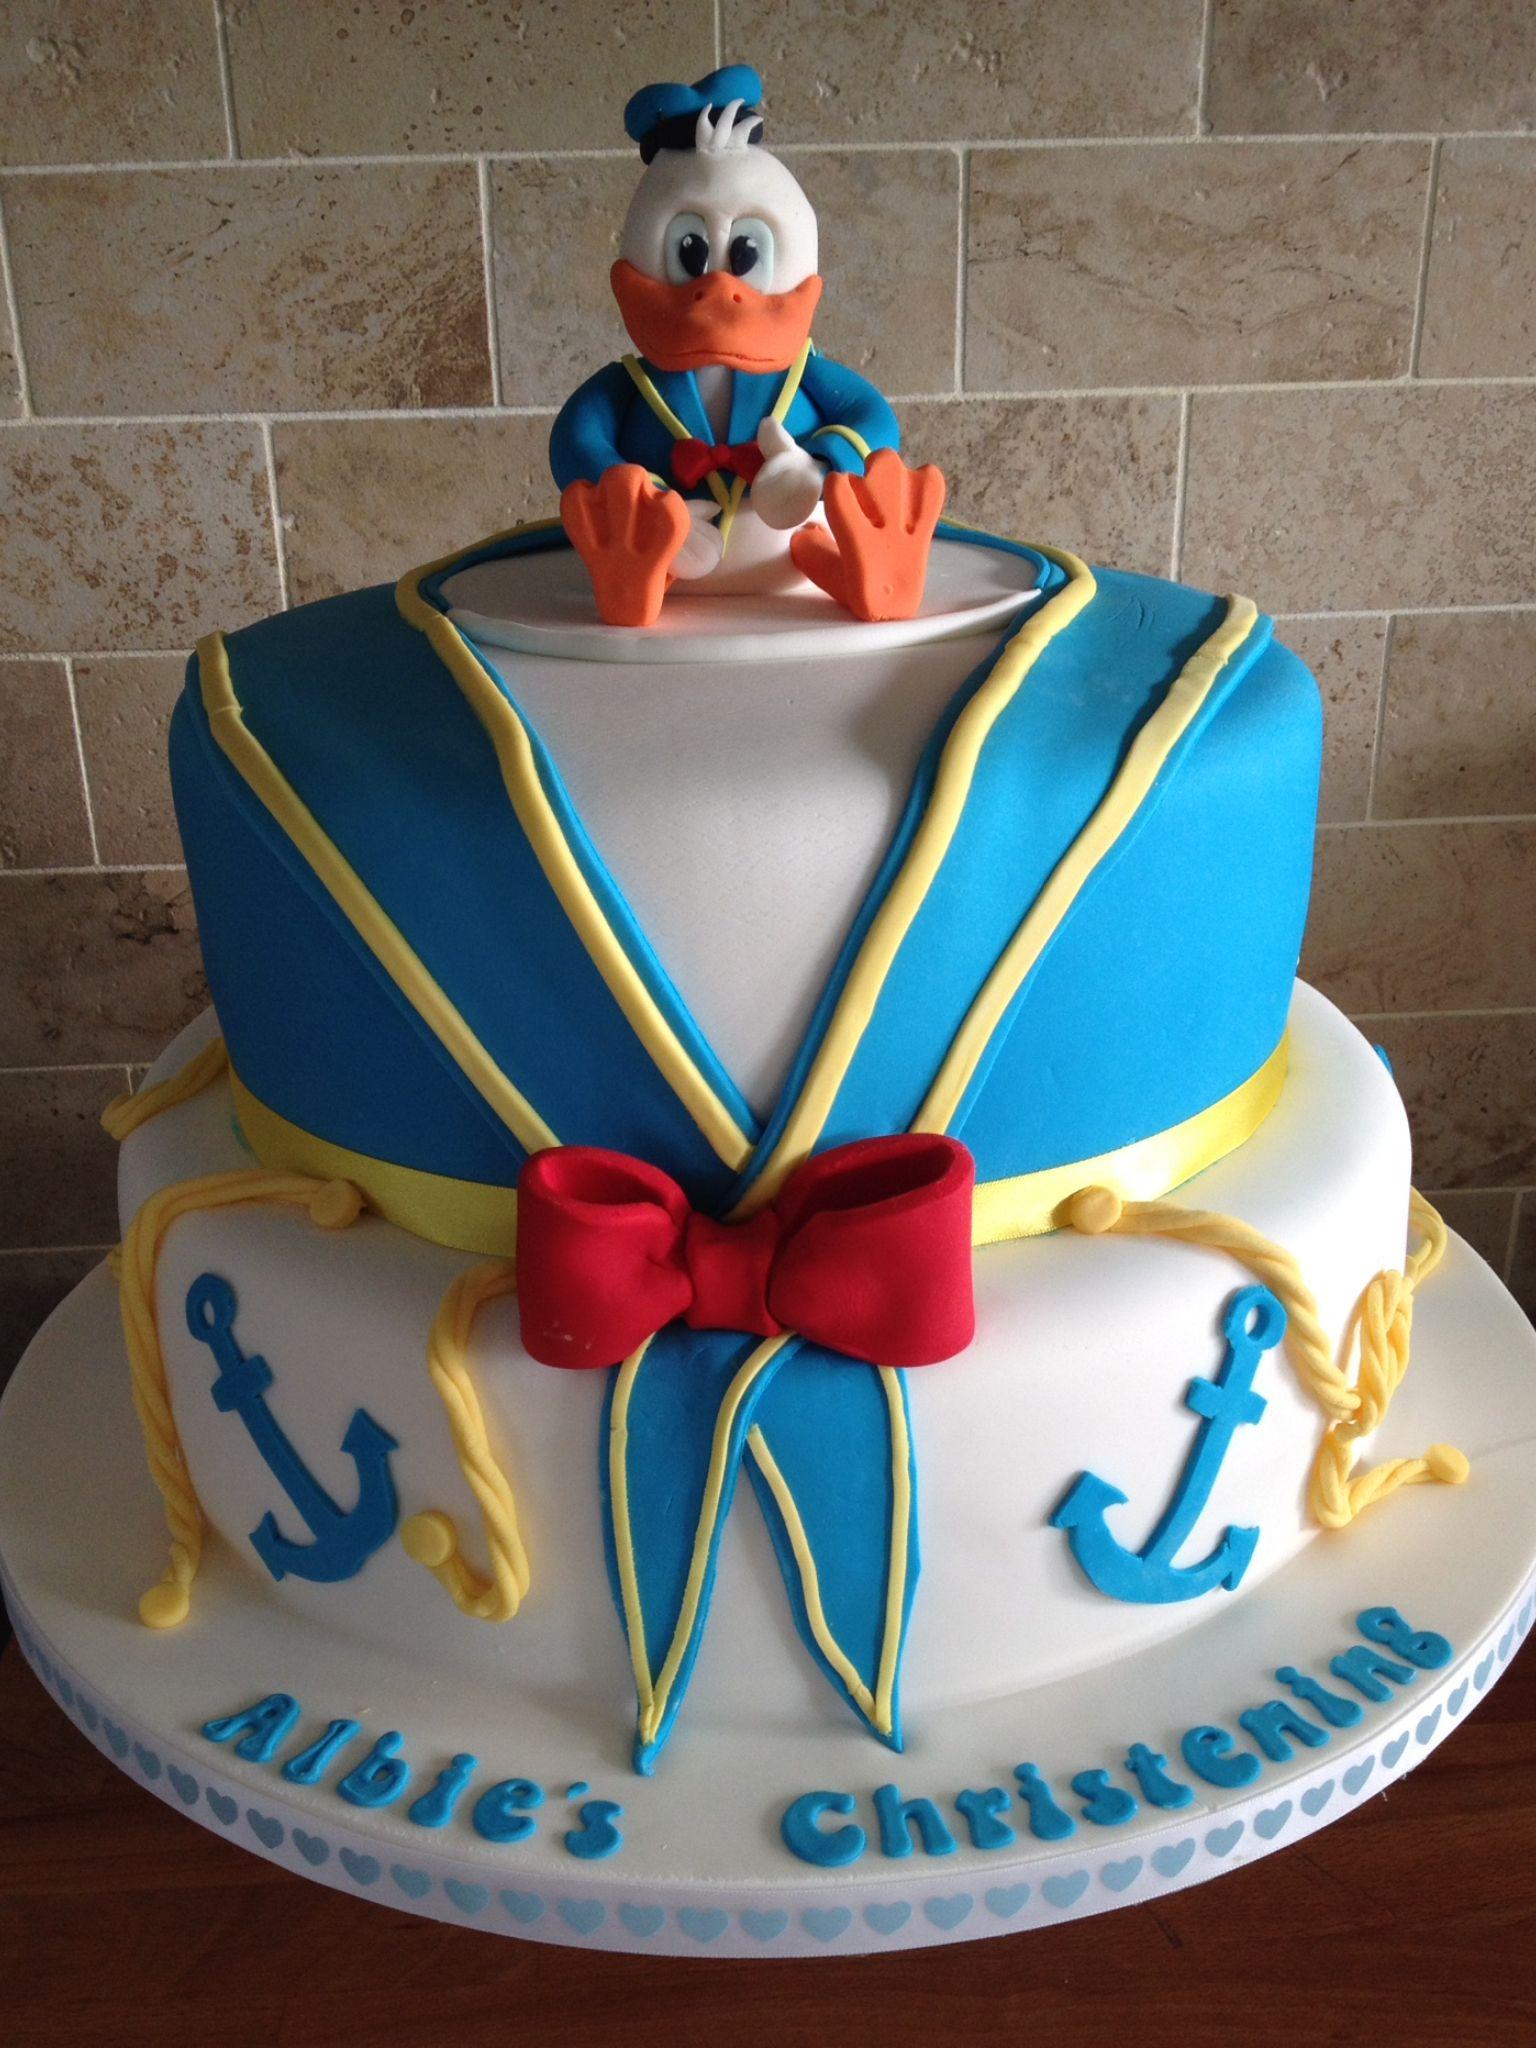 Donald Duck Christening Cake Kanyon Is Turning 3 Cake